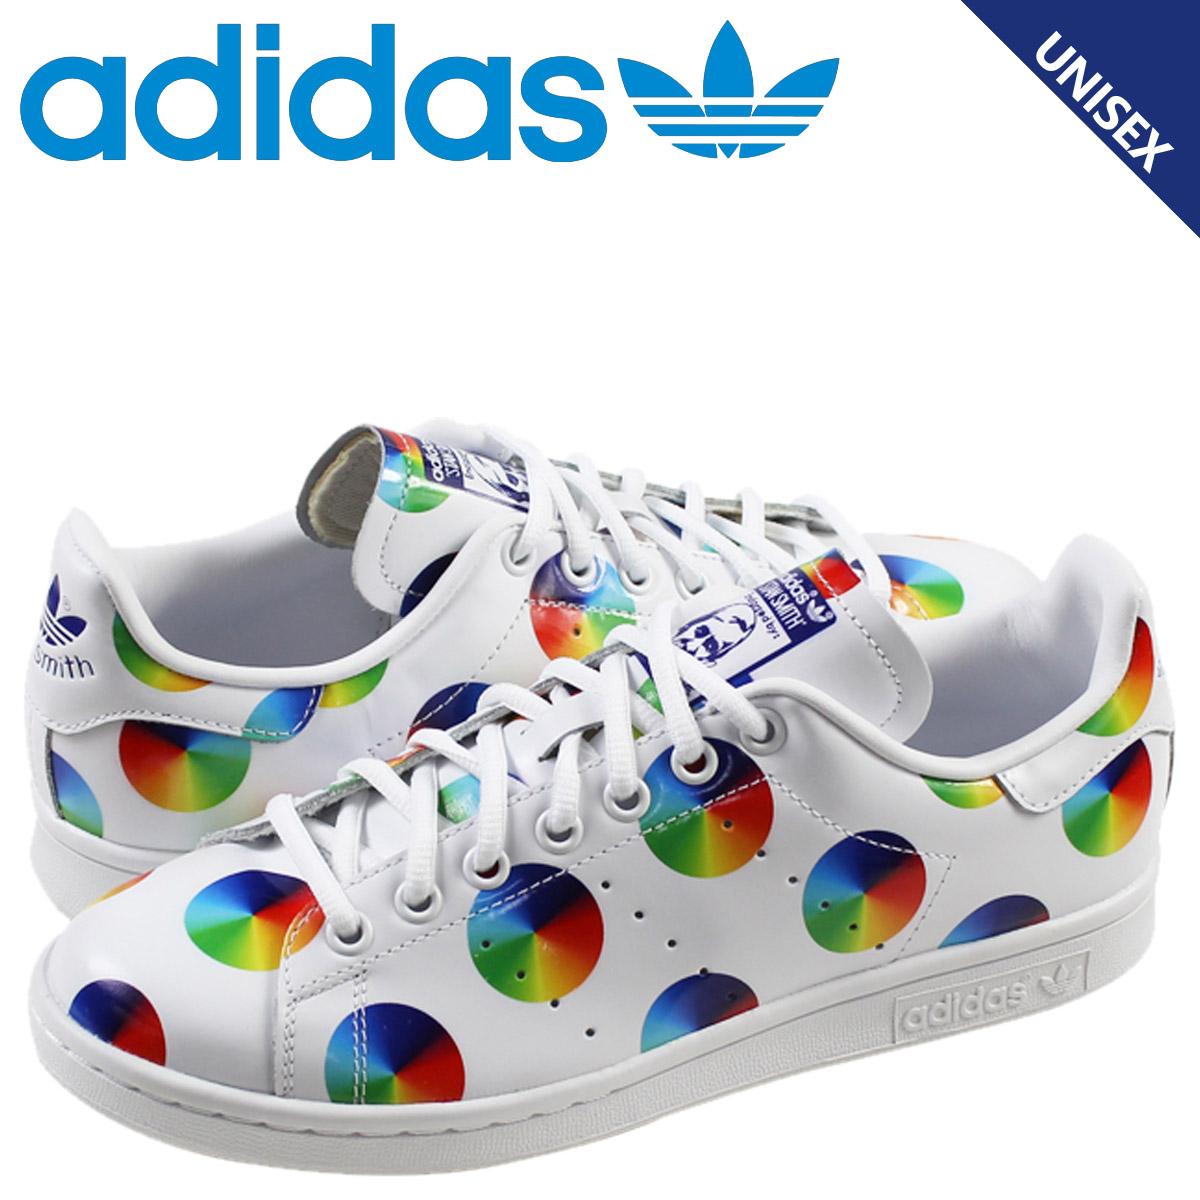 adidas stan smith with name